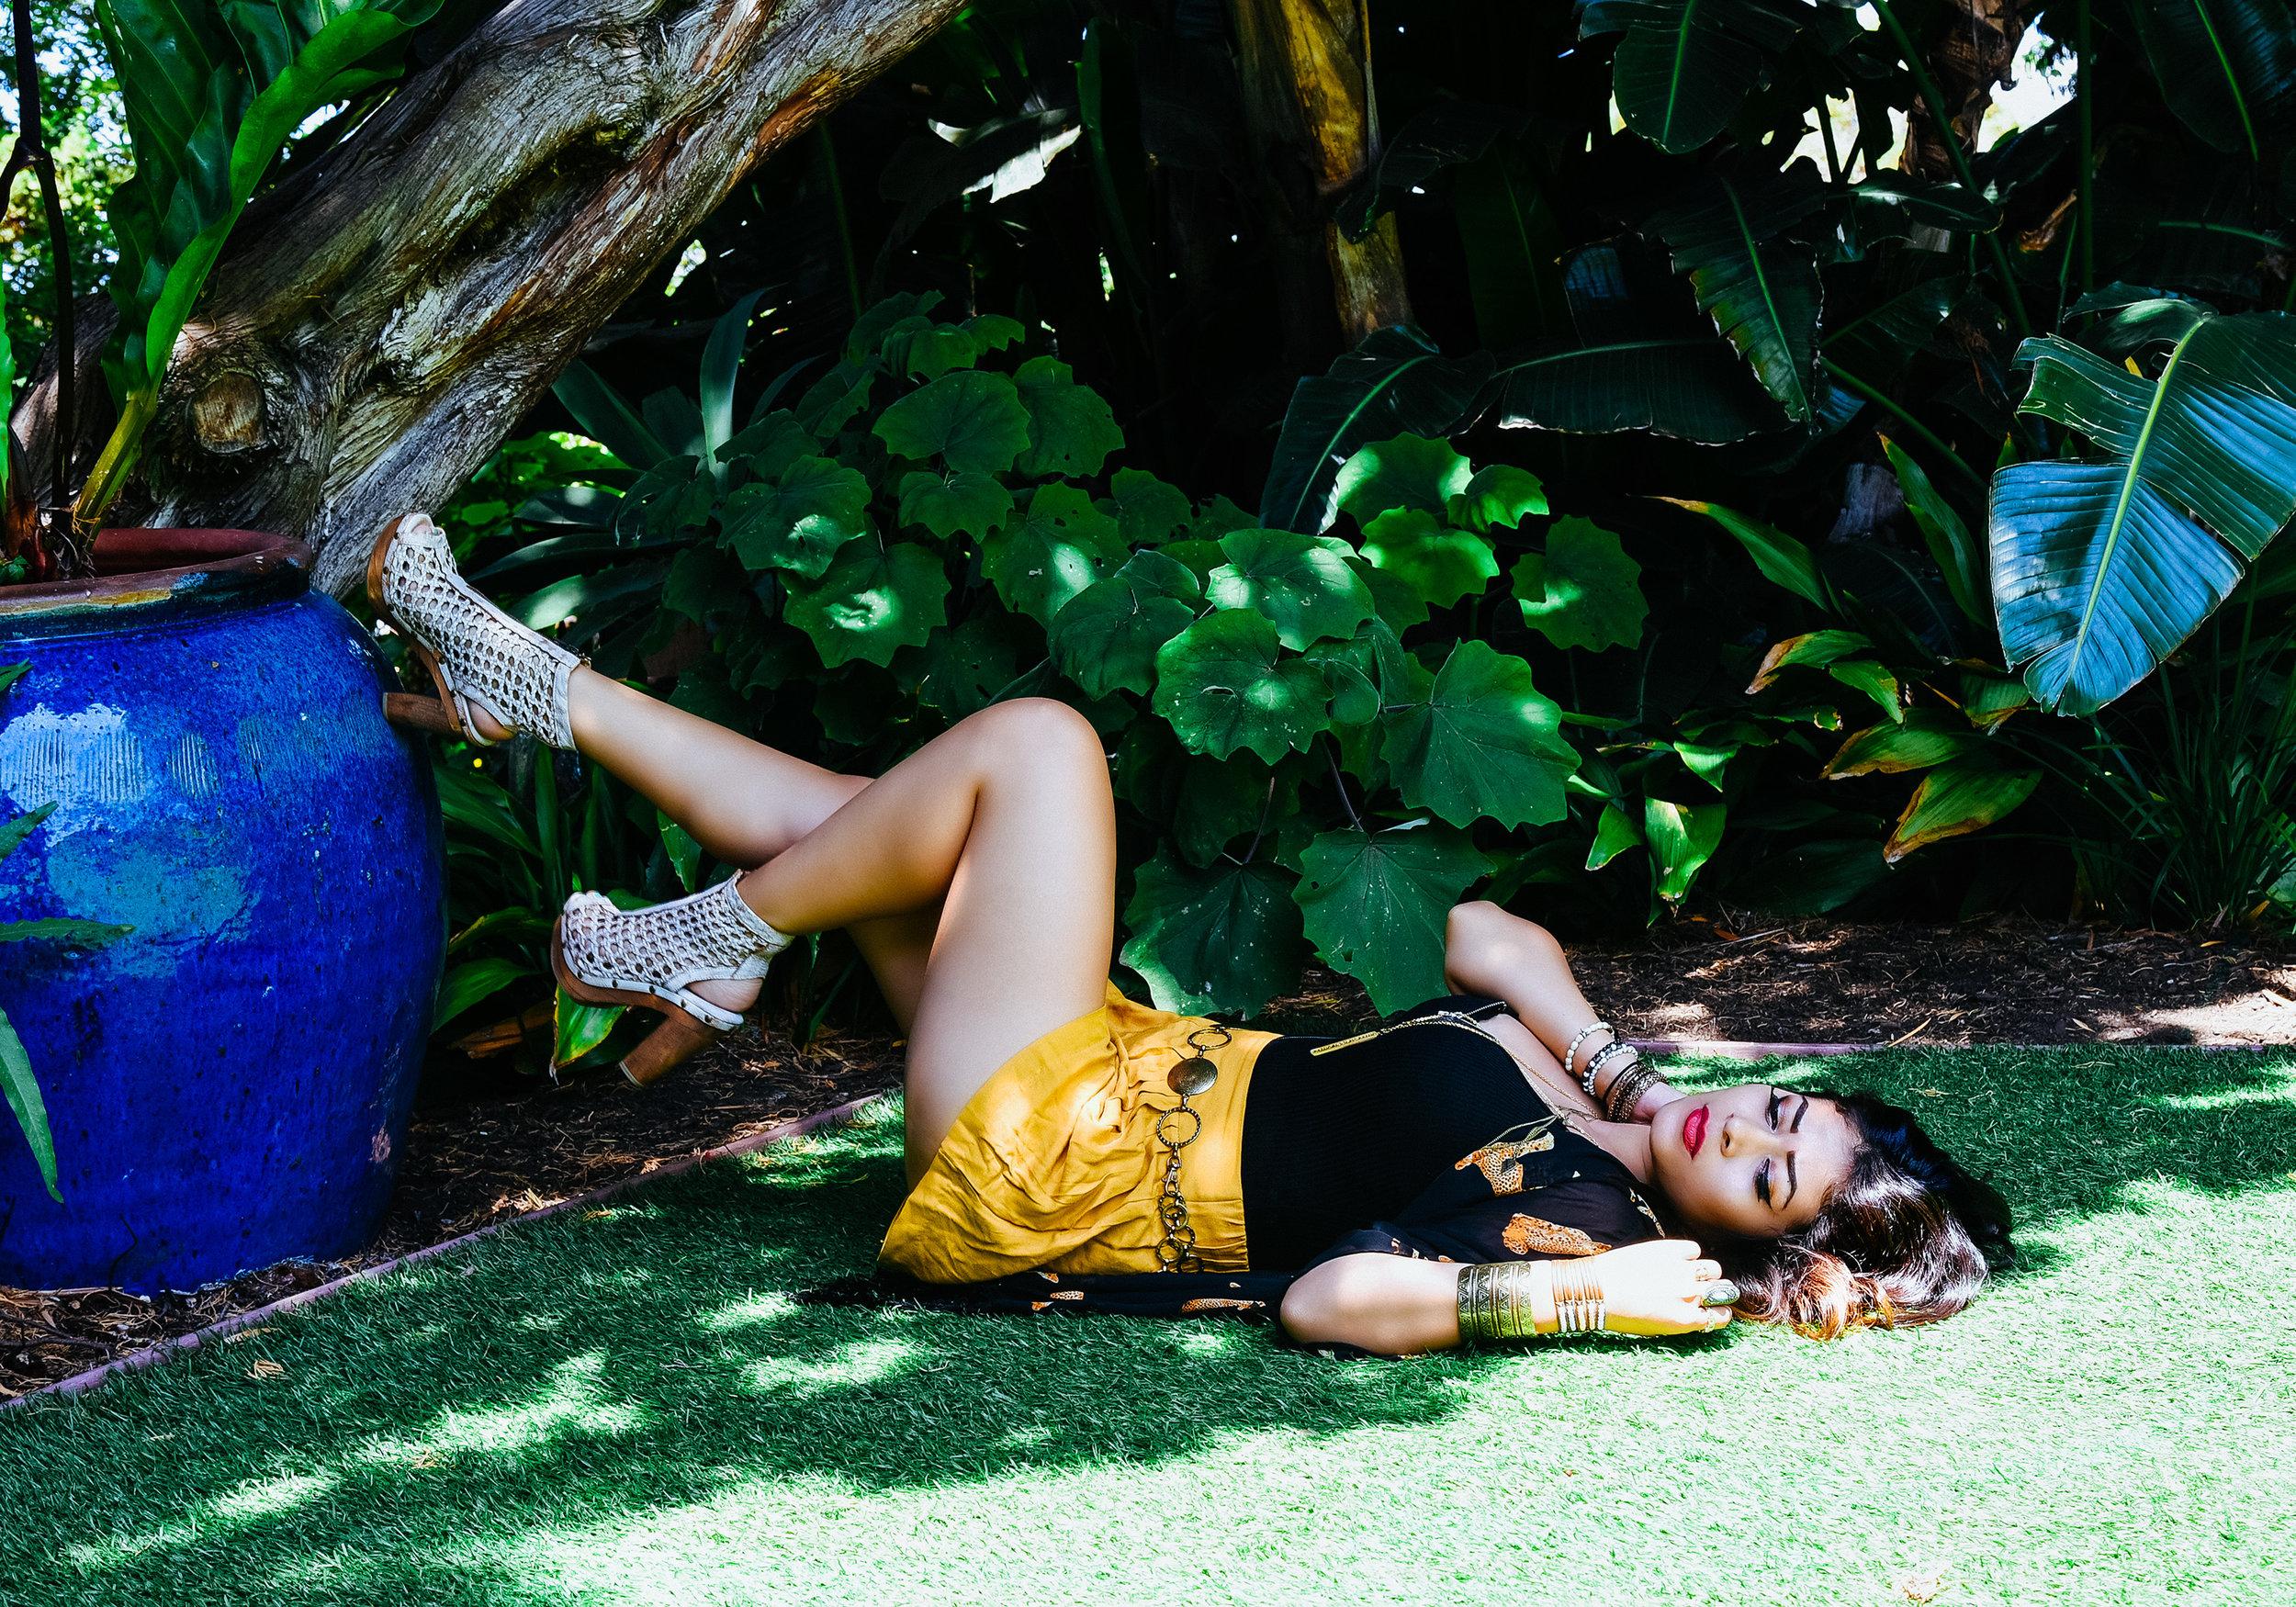 Fashion Jewelry Yellow Skirt Shoes | Fashion Photography | Lacey O | Washington DC